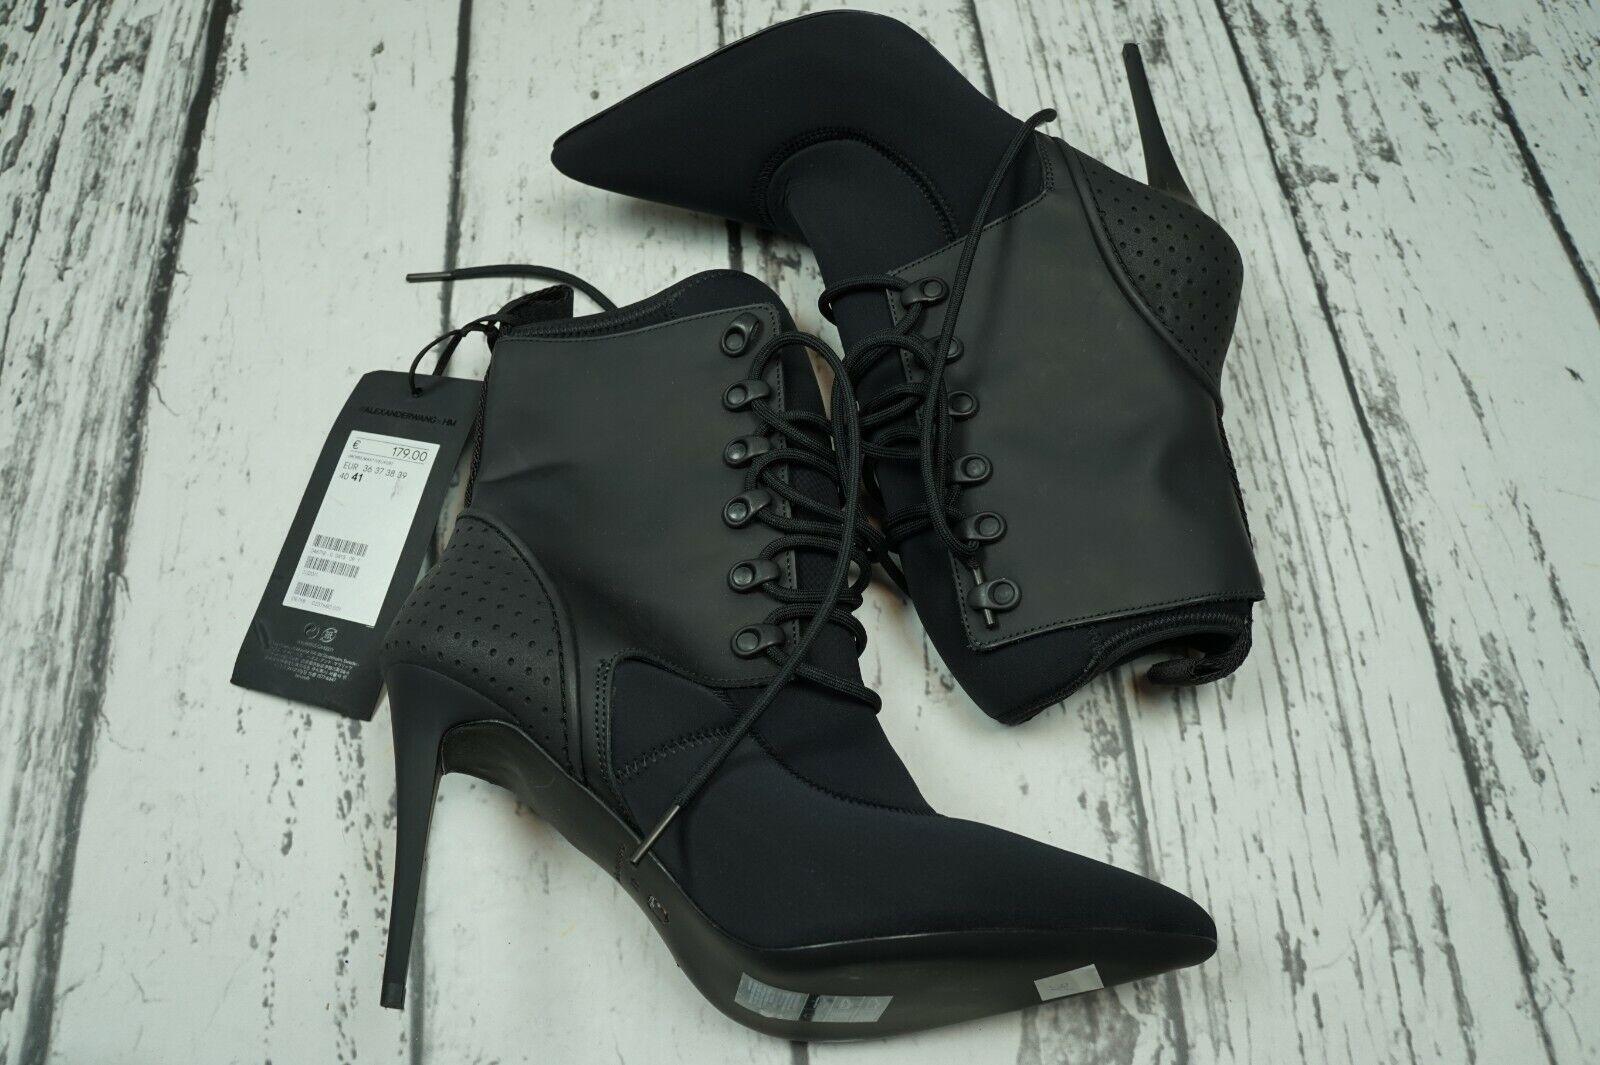 vendita online ALEXANDER WANG H&M Pointed Scuba Fabric Leather Laces stivali stivali stivali Heels 41 US9,5 (17)  prezzo all'ingrosso